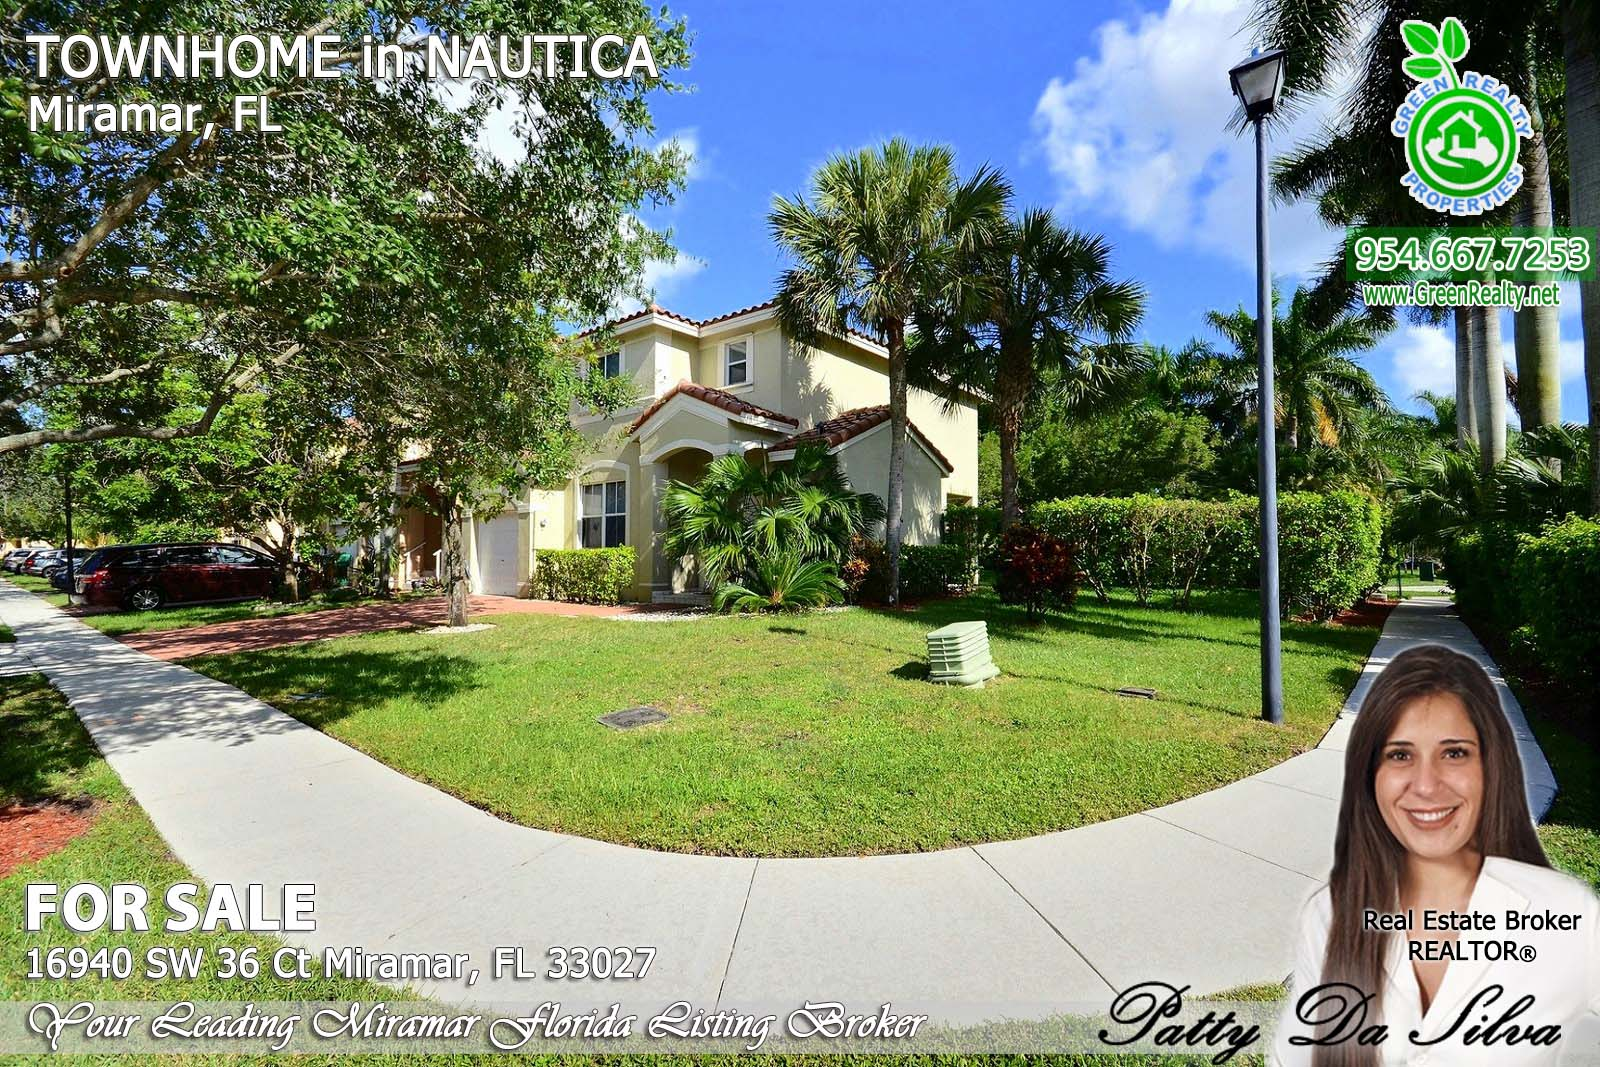 16940 SW 36 Ct Miramar, FL 33027 - Nautica Miramar Homes For Sale (3)